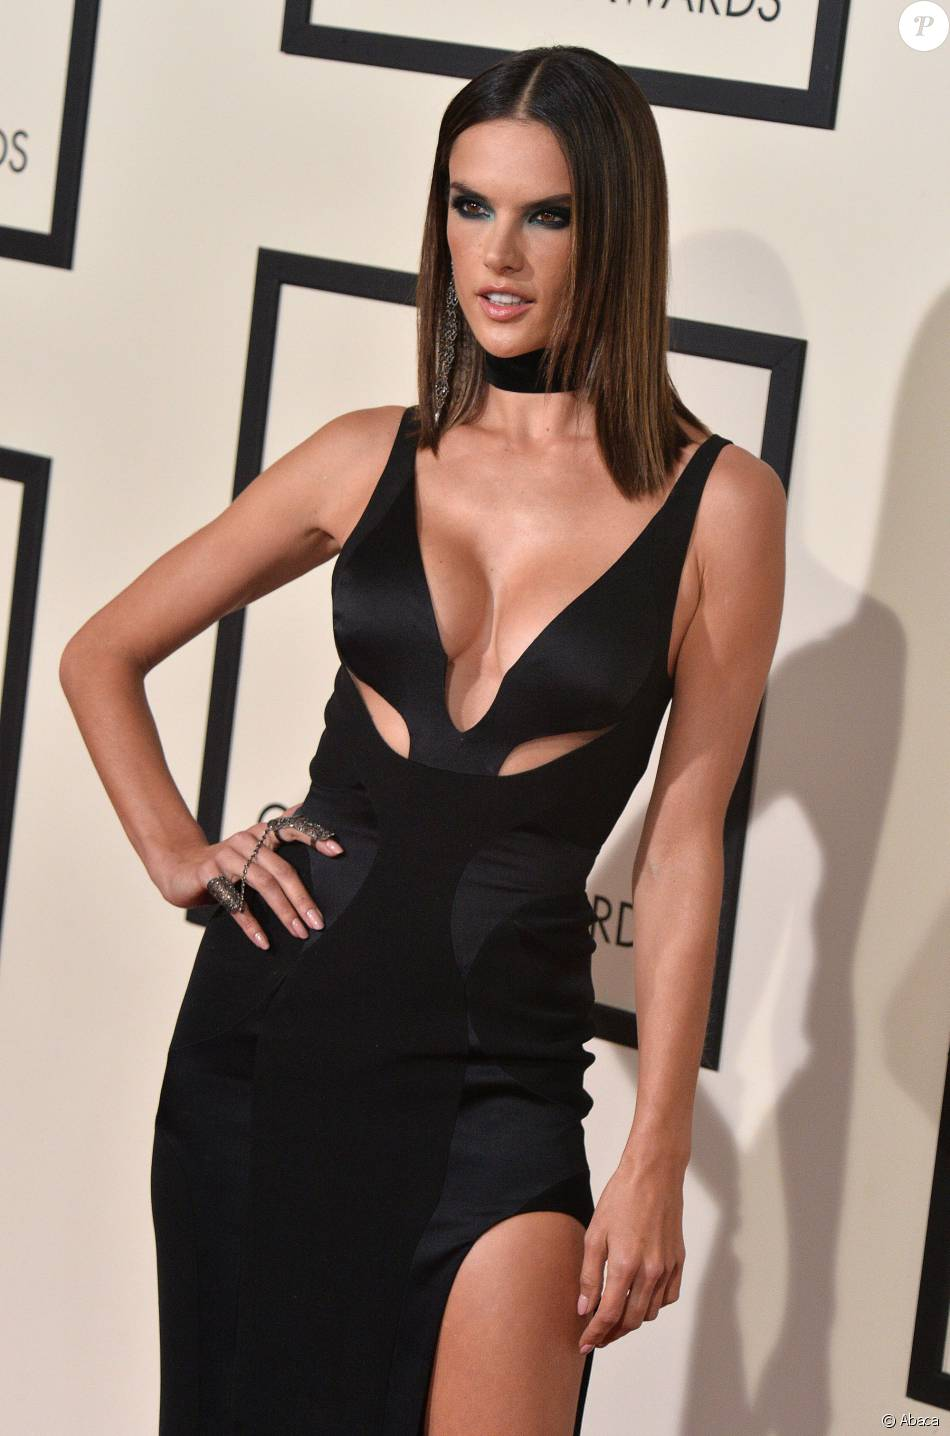 Sexy Ciara nudes (17 foto and video), Ass, Hot, Twitter, panties 2015